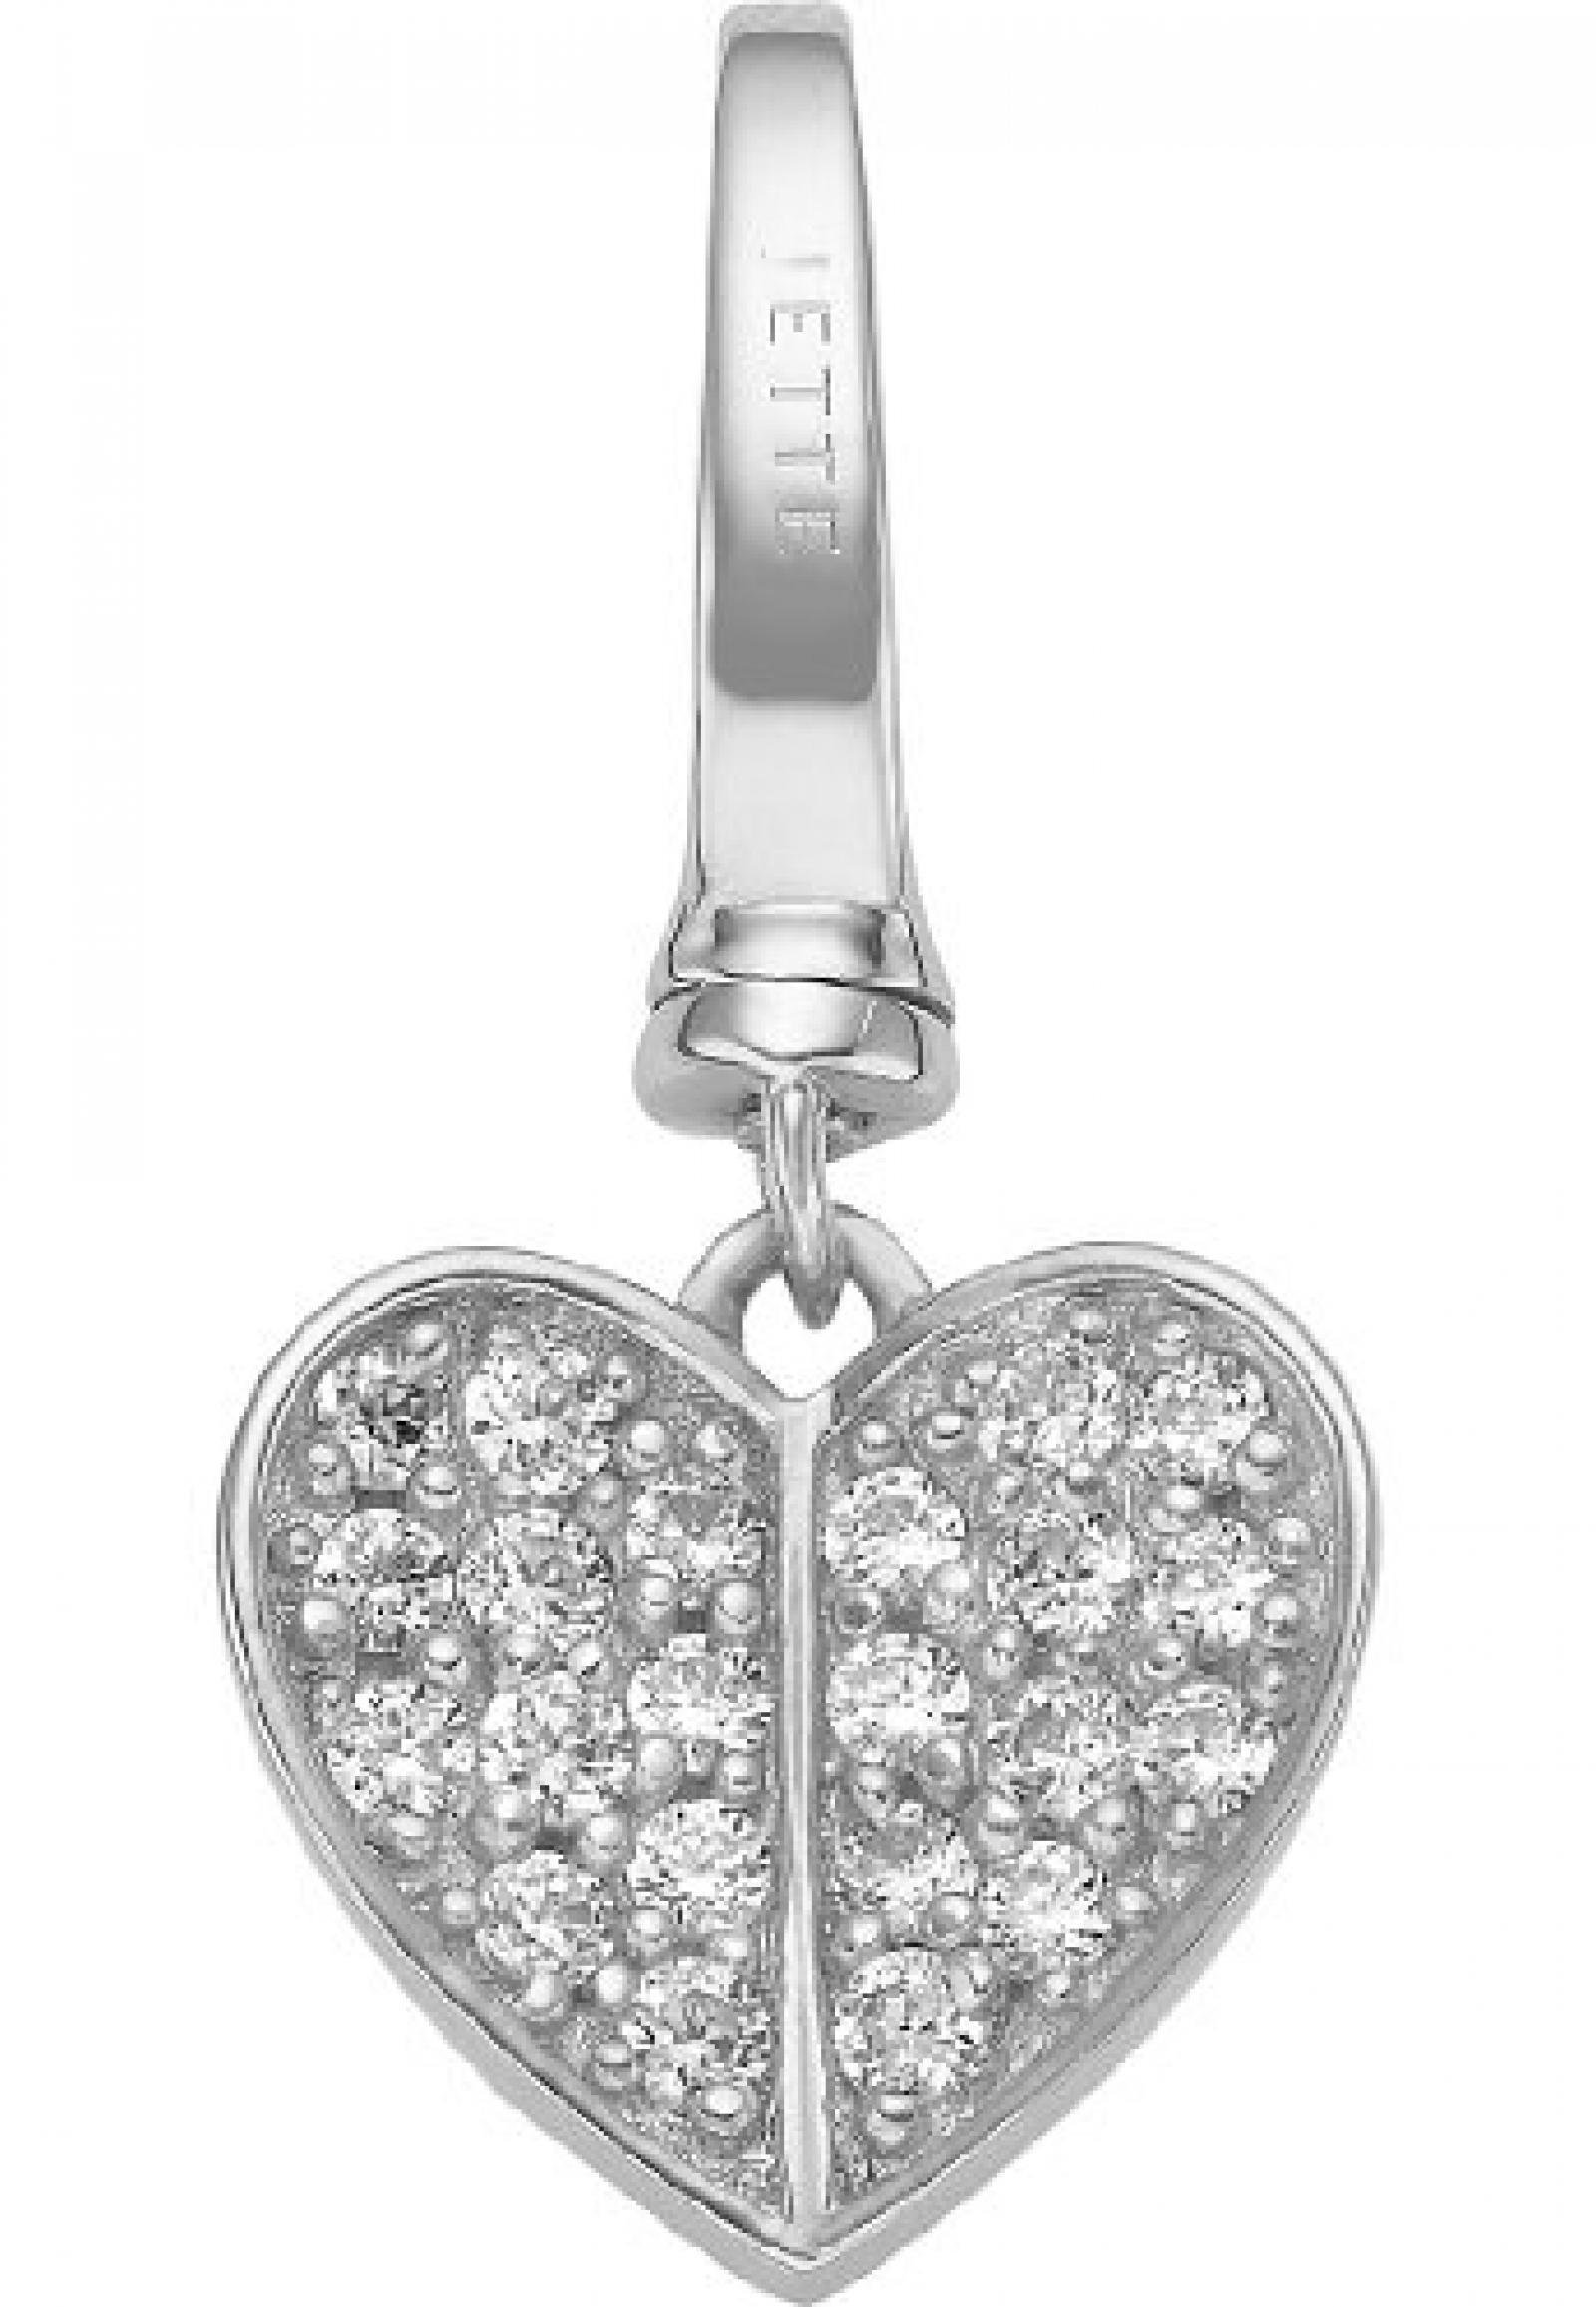 JETTE Charms Damen-Charm CHARM 925er Silber rhodiniert 22 Zirkonia One Size, silber